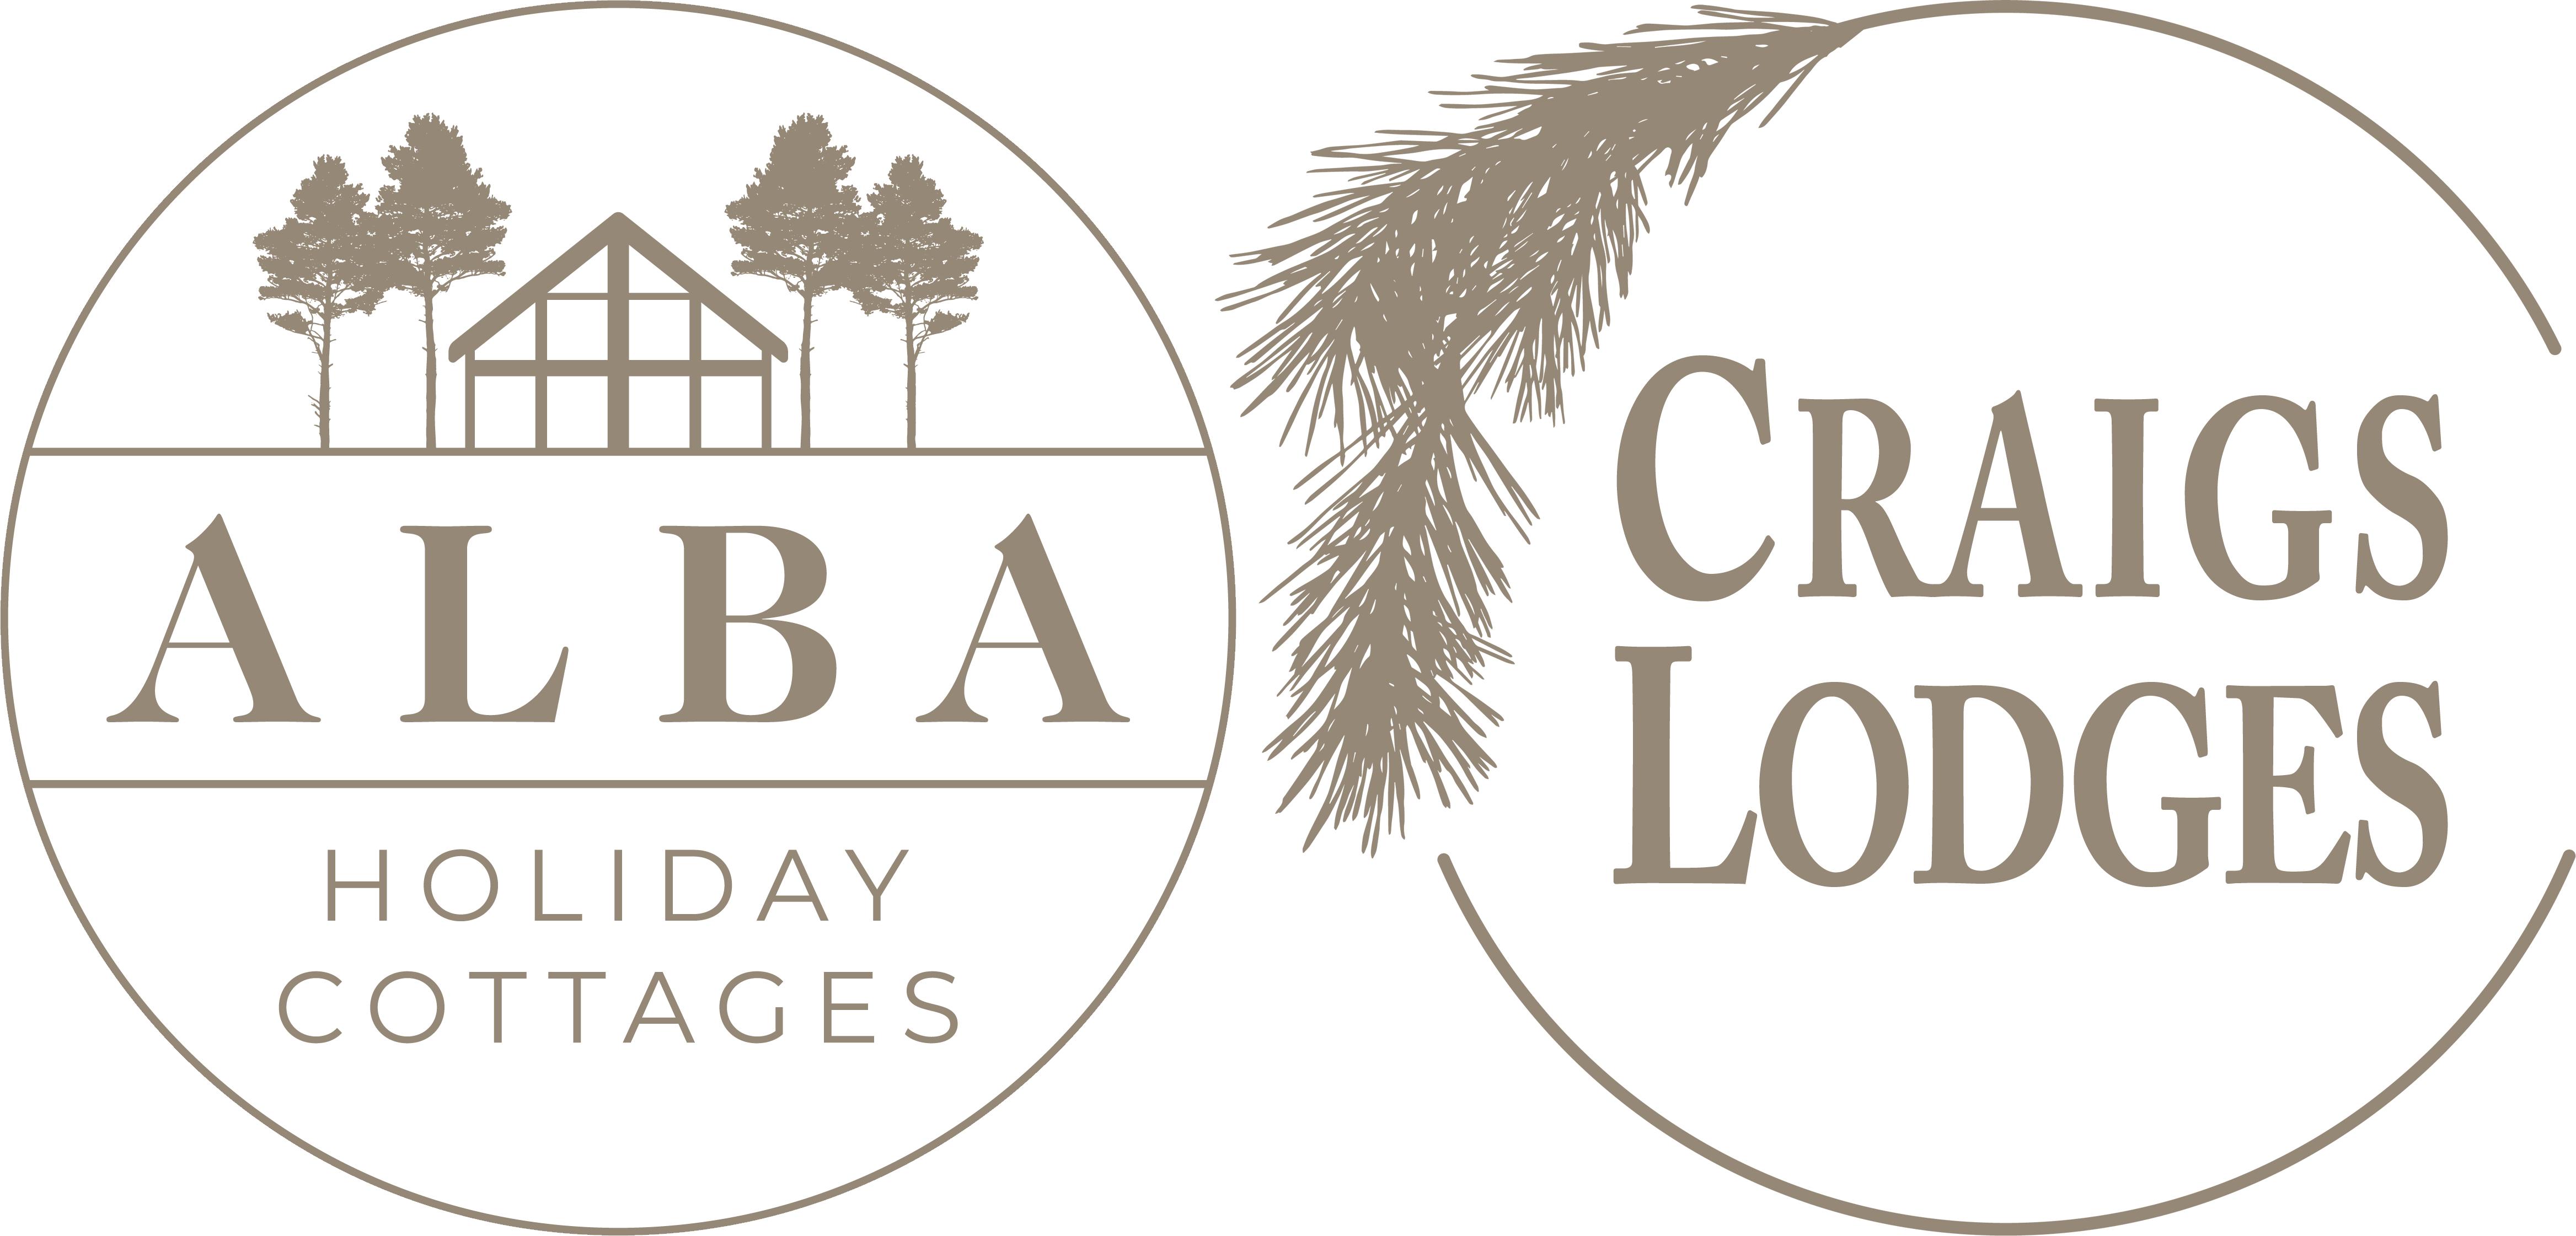 Alba Holiday Cottages & Craigs Lodges